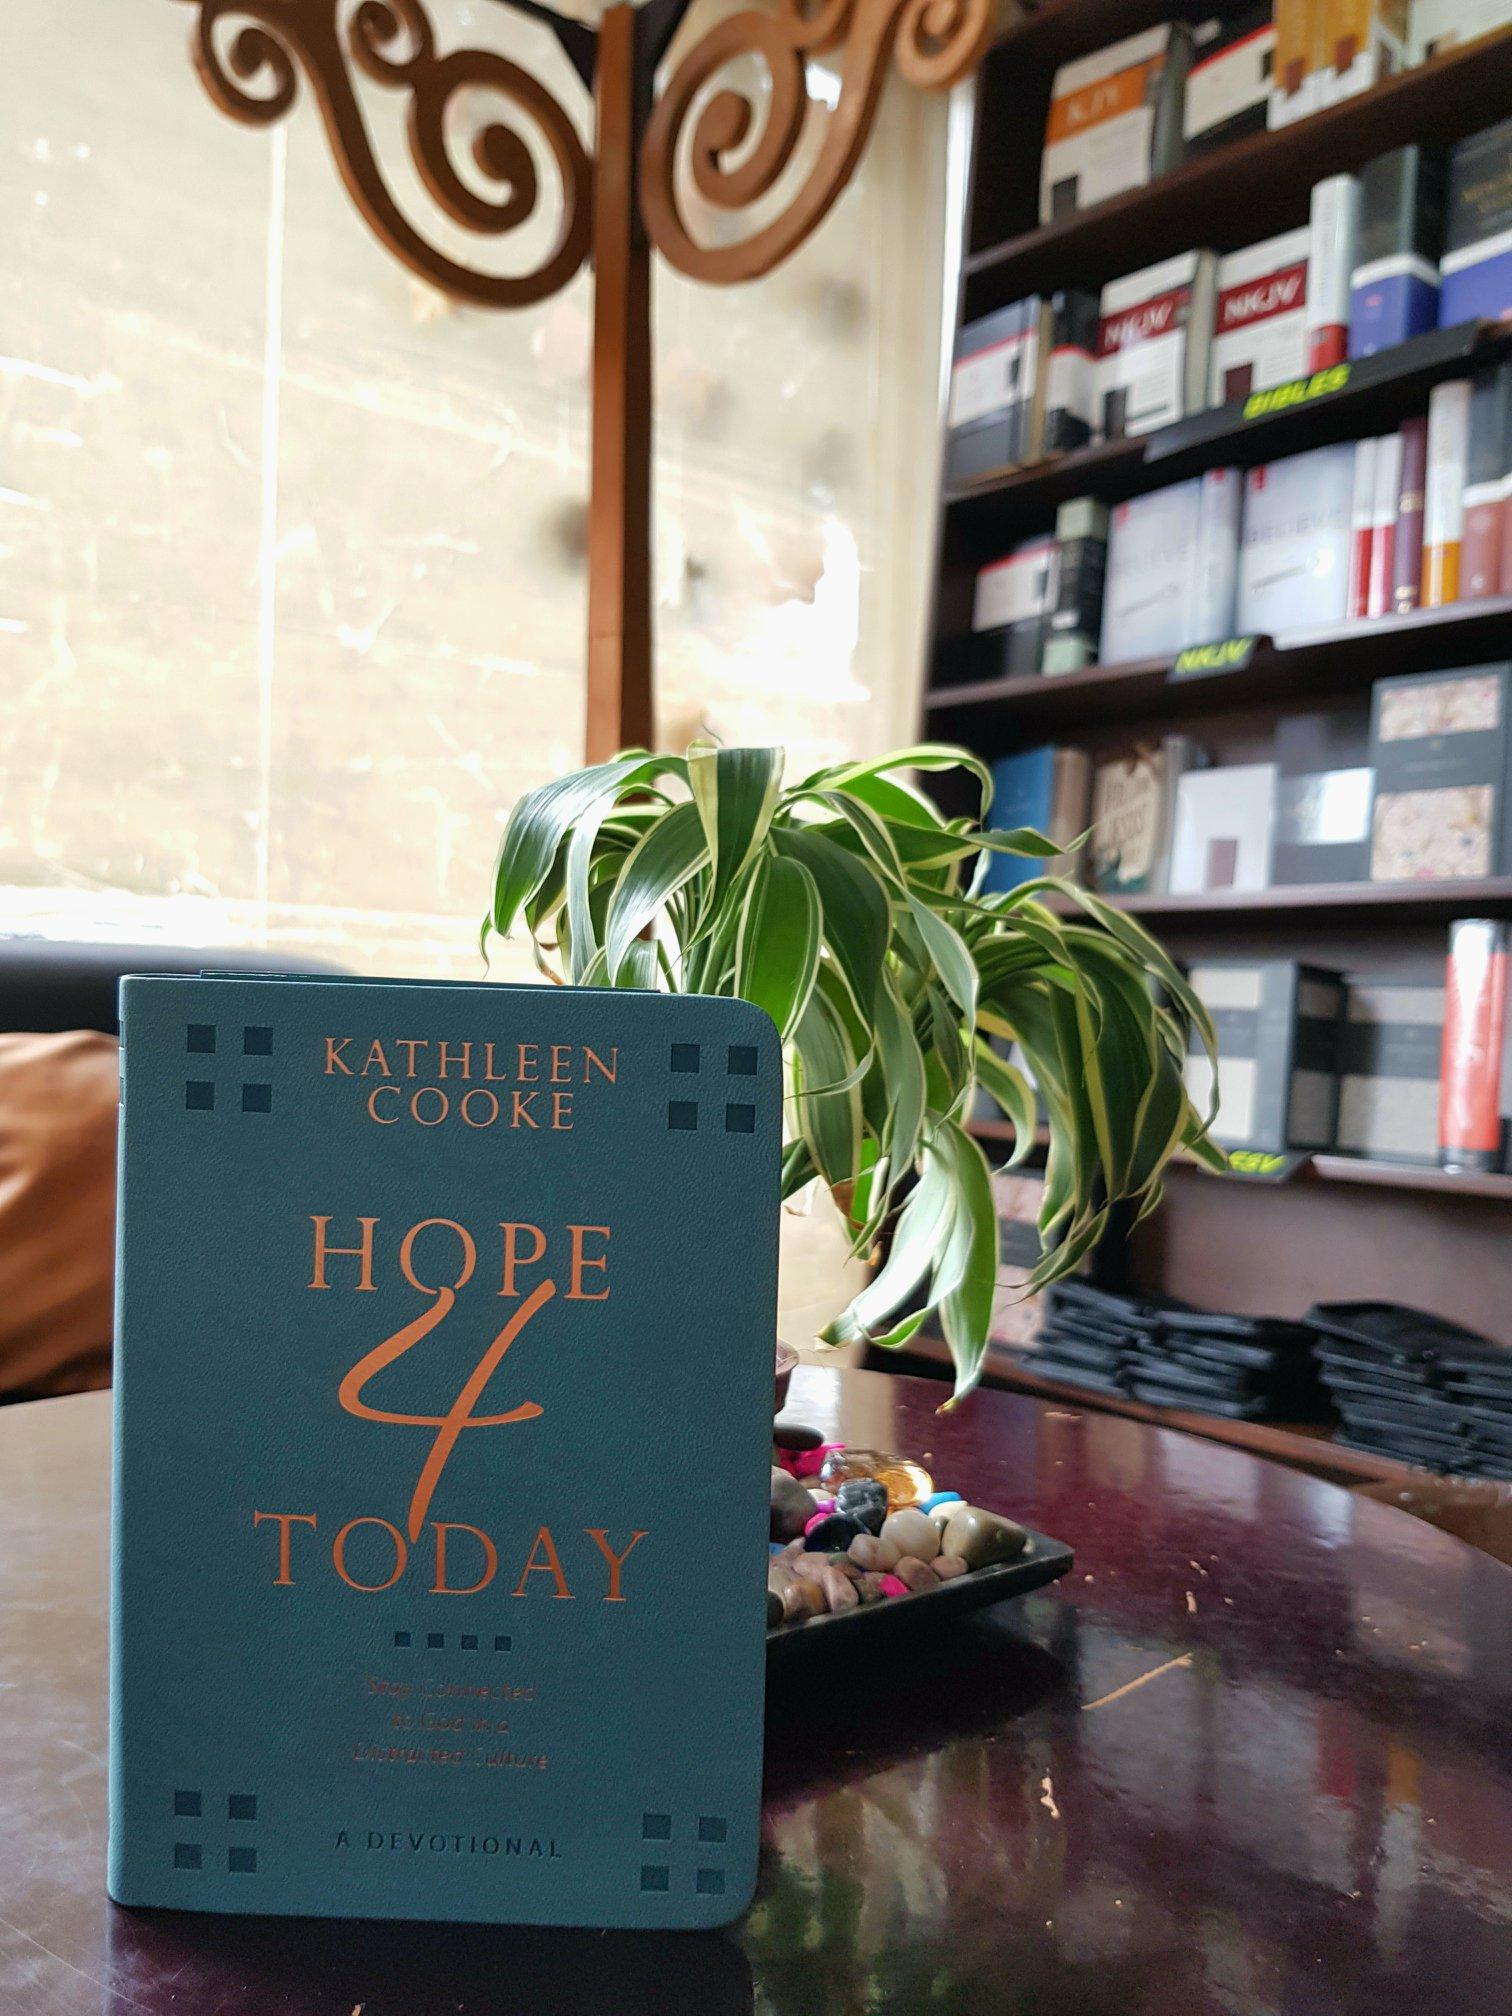 hope 4 today.jpg